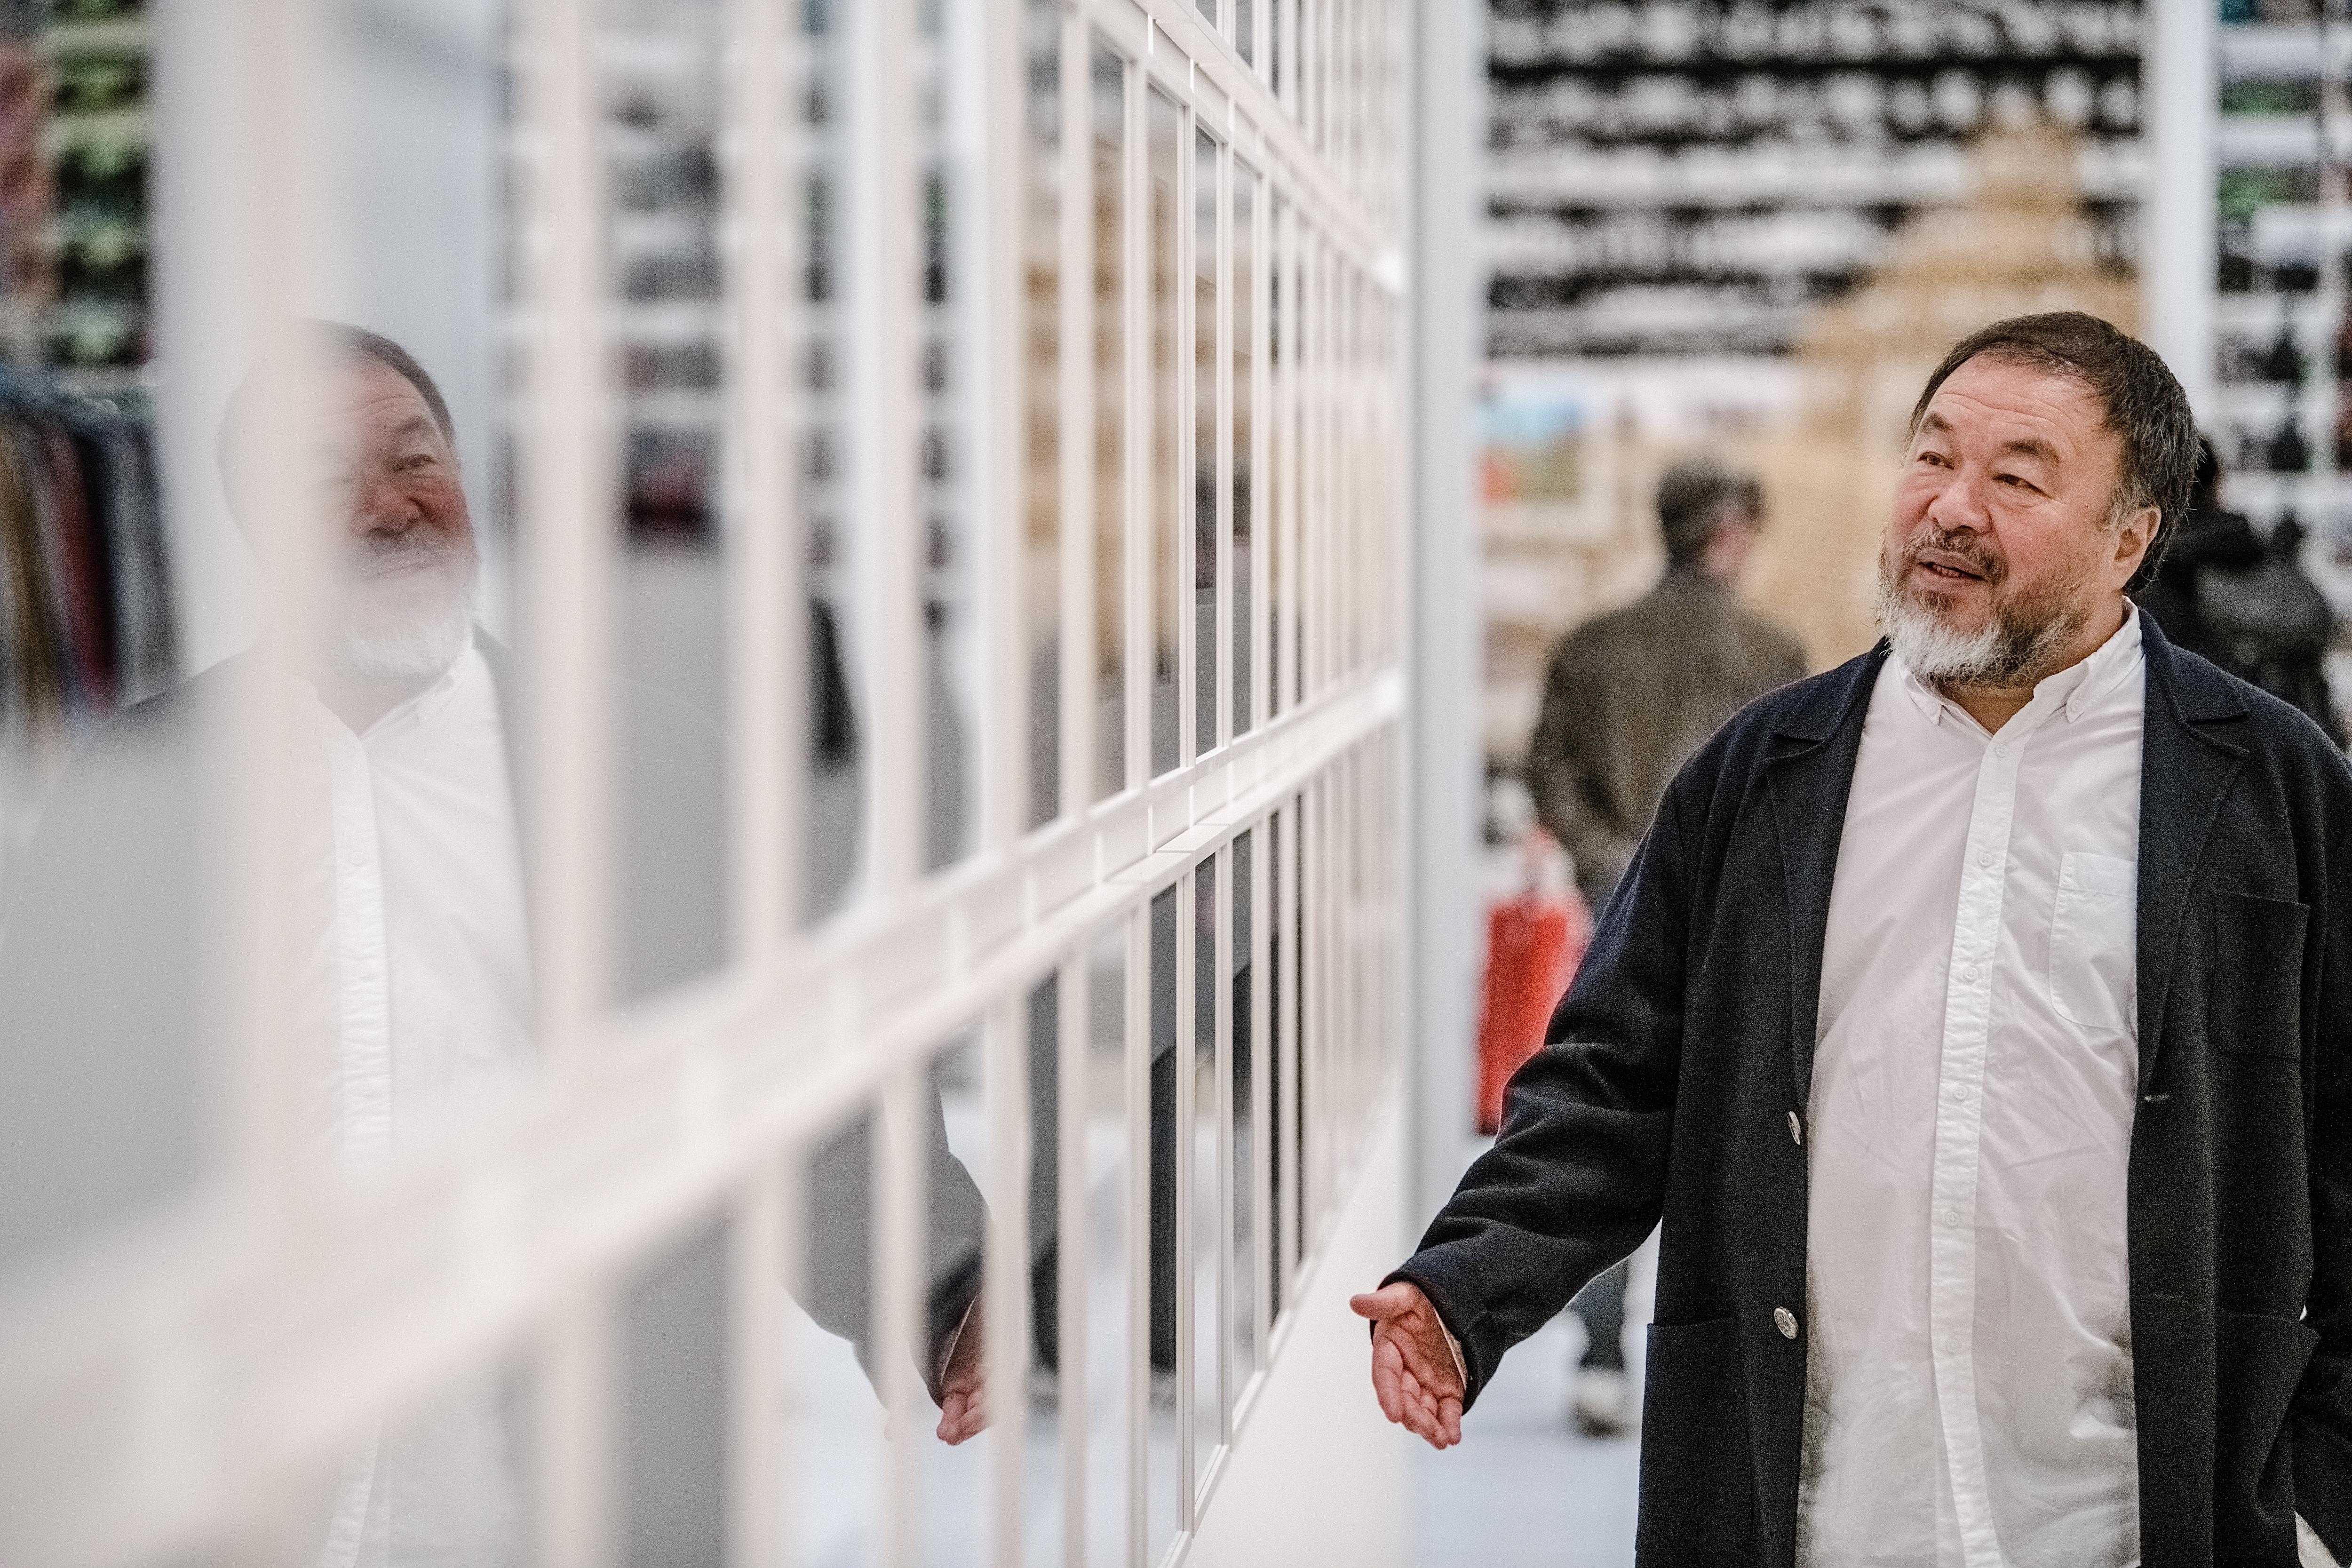 Kidobták Ai Weiweit a müncheni Haus der Kunstból